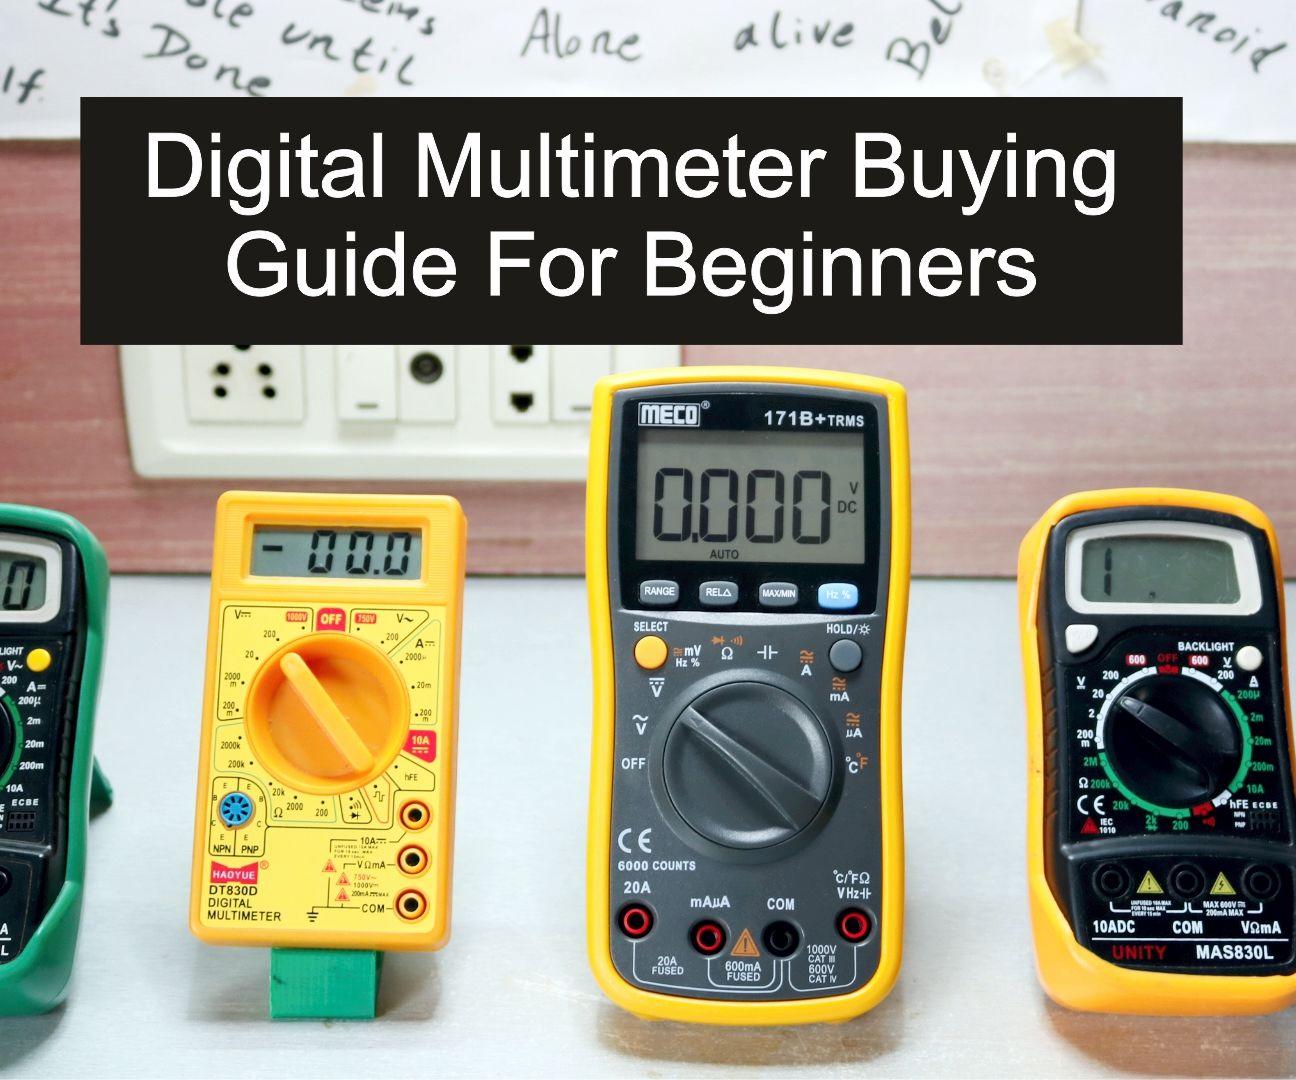 Multimeter Buying Guide for Beginners